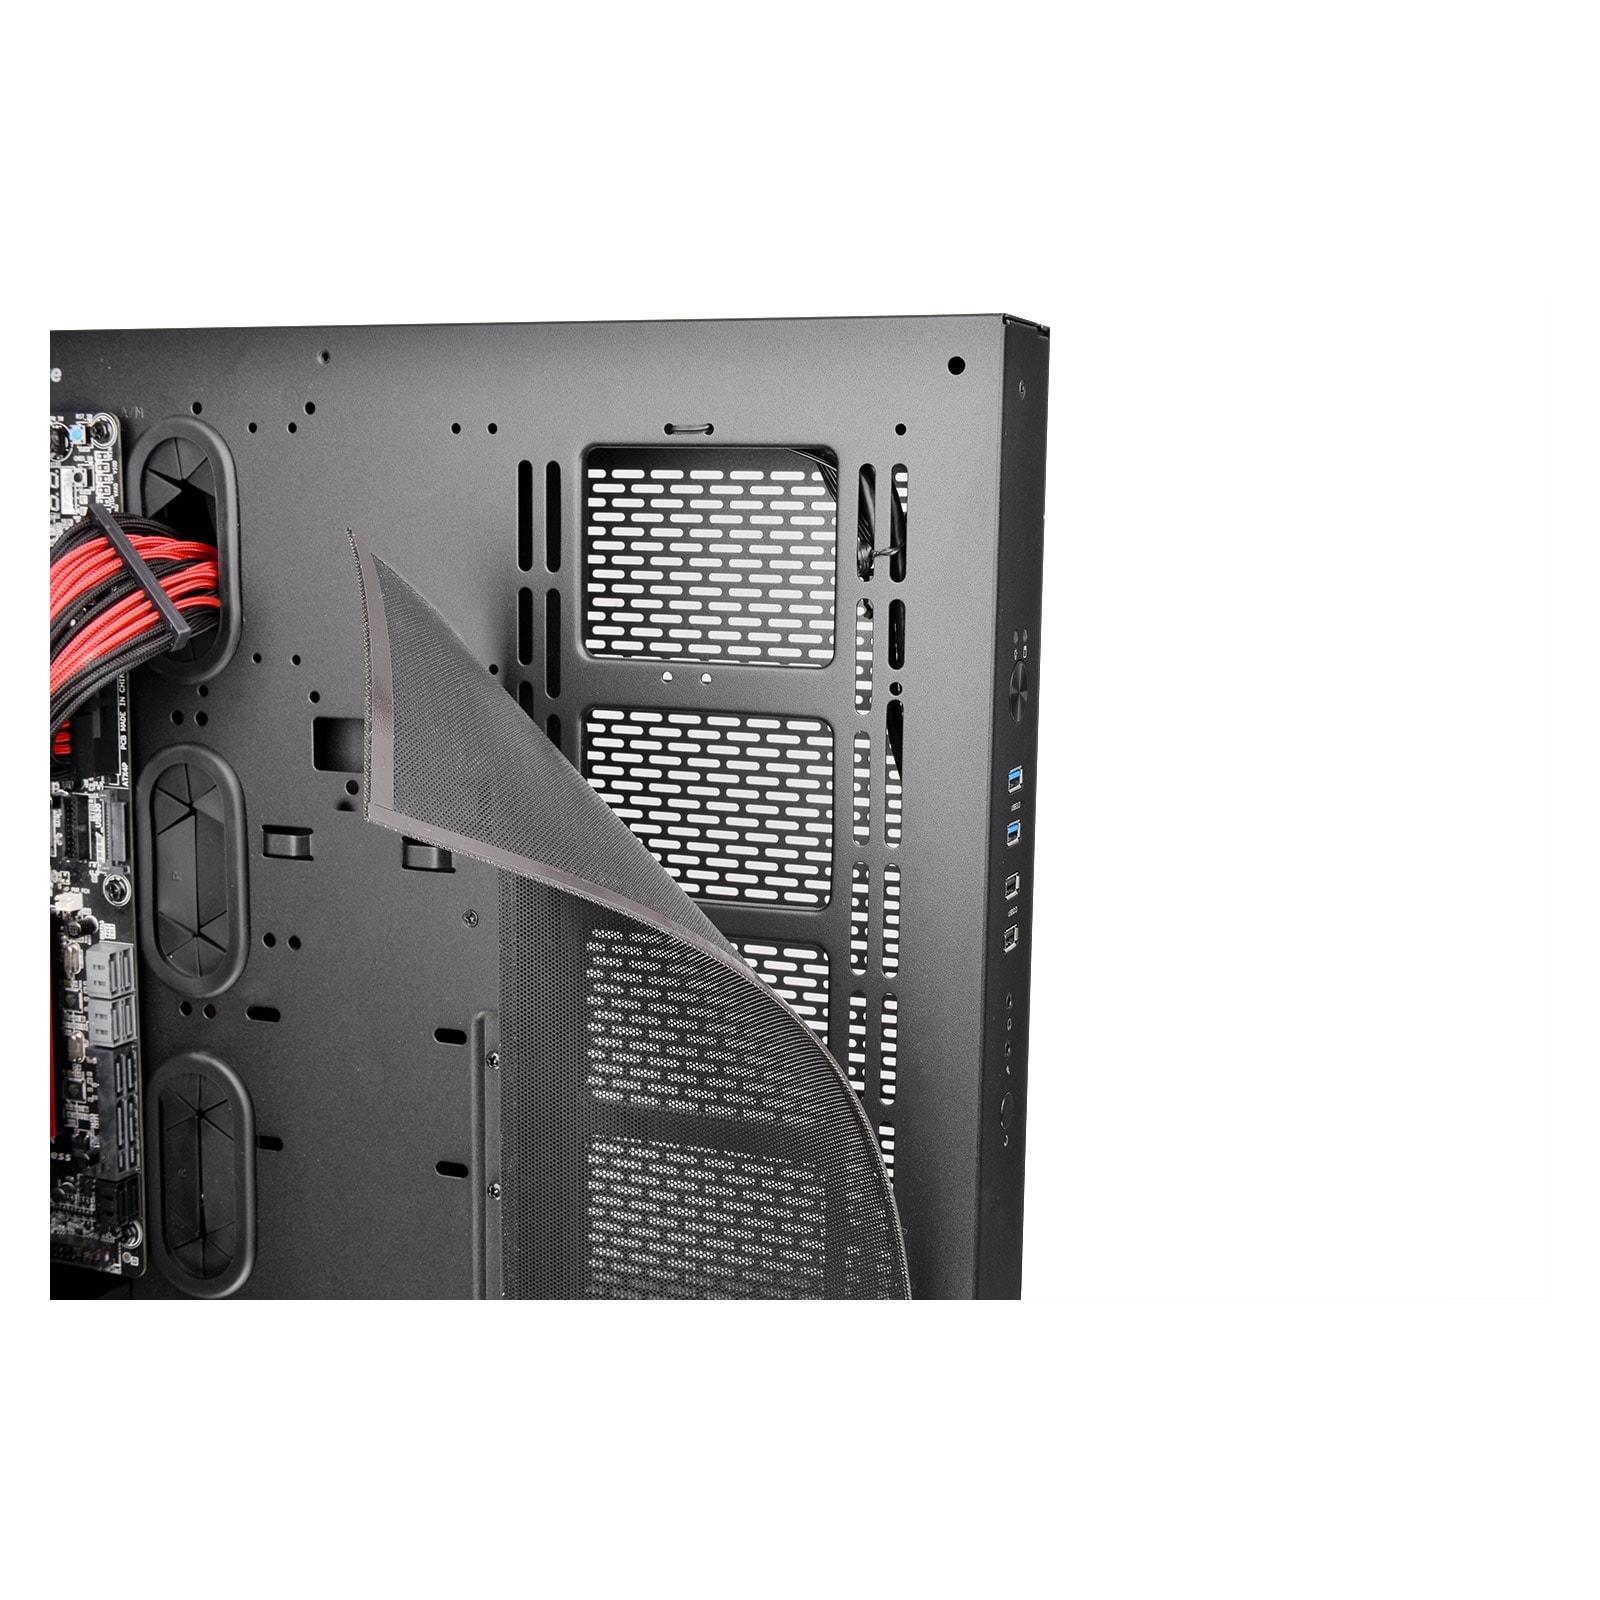 Thermaltake Core P5 (CA-1E7-00M1WN-00) - Achat / Vente Boîtier PC sur Cybertek.fr - 3